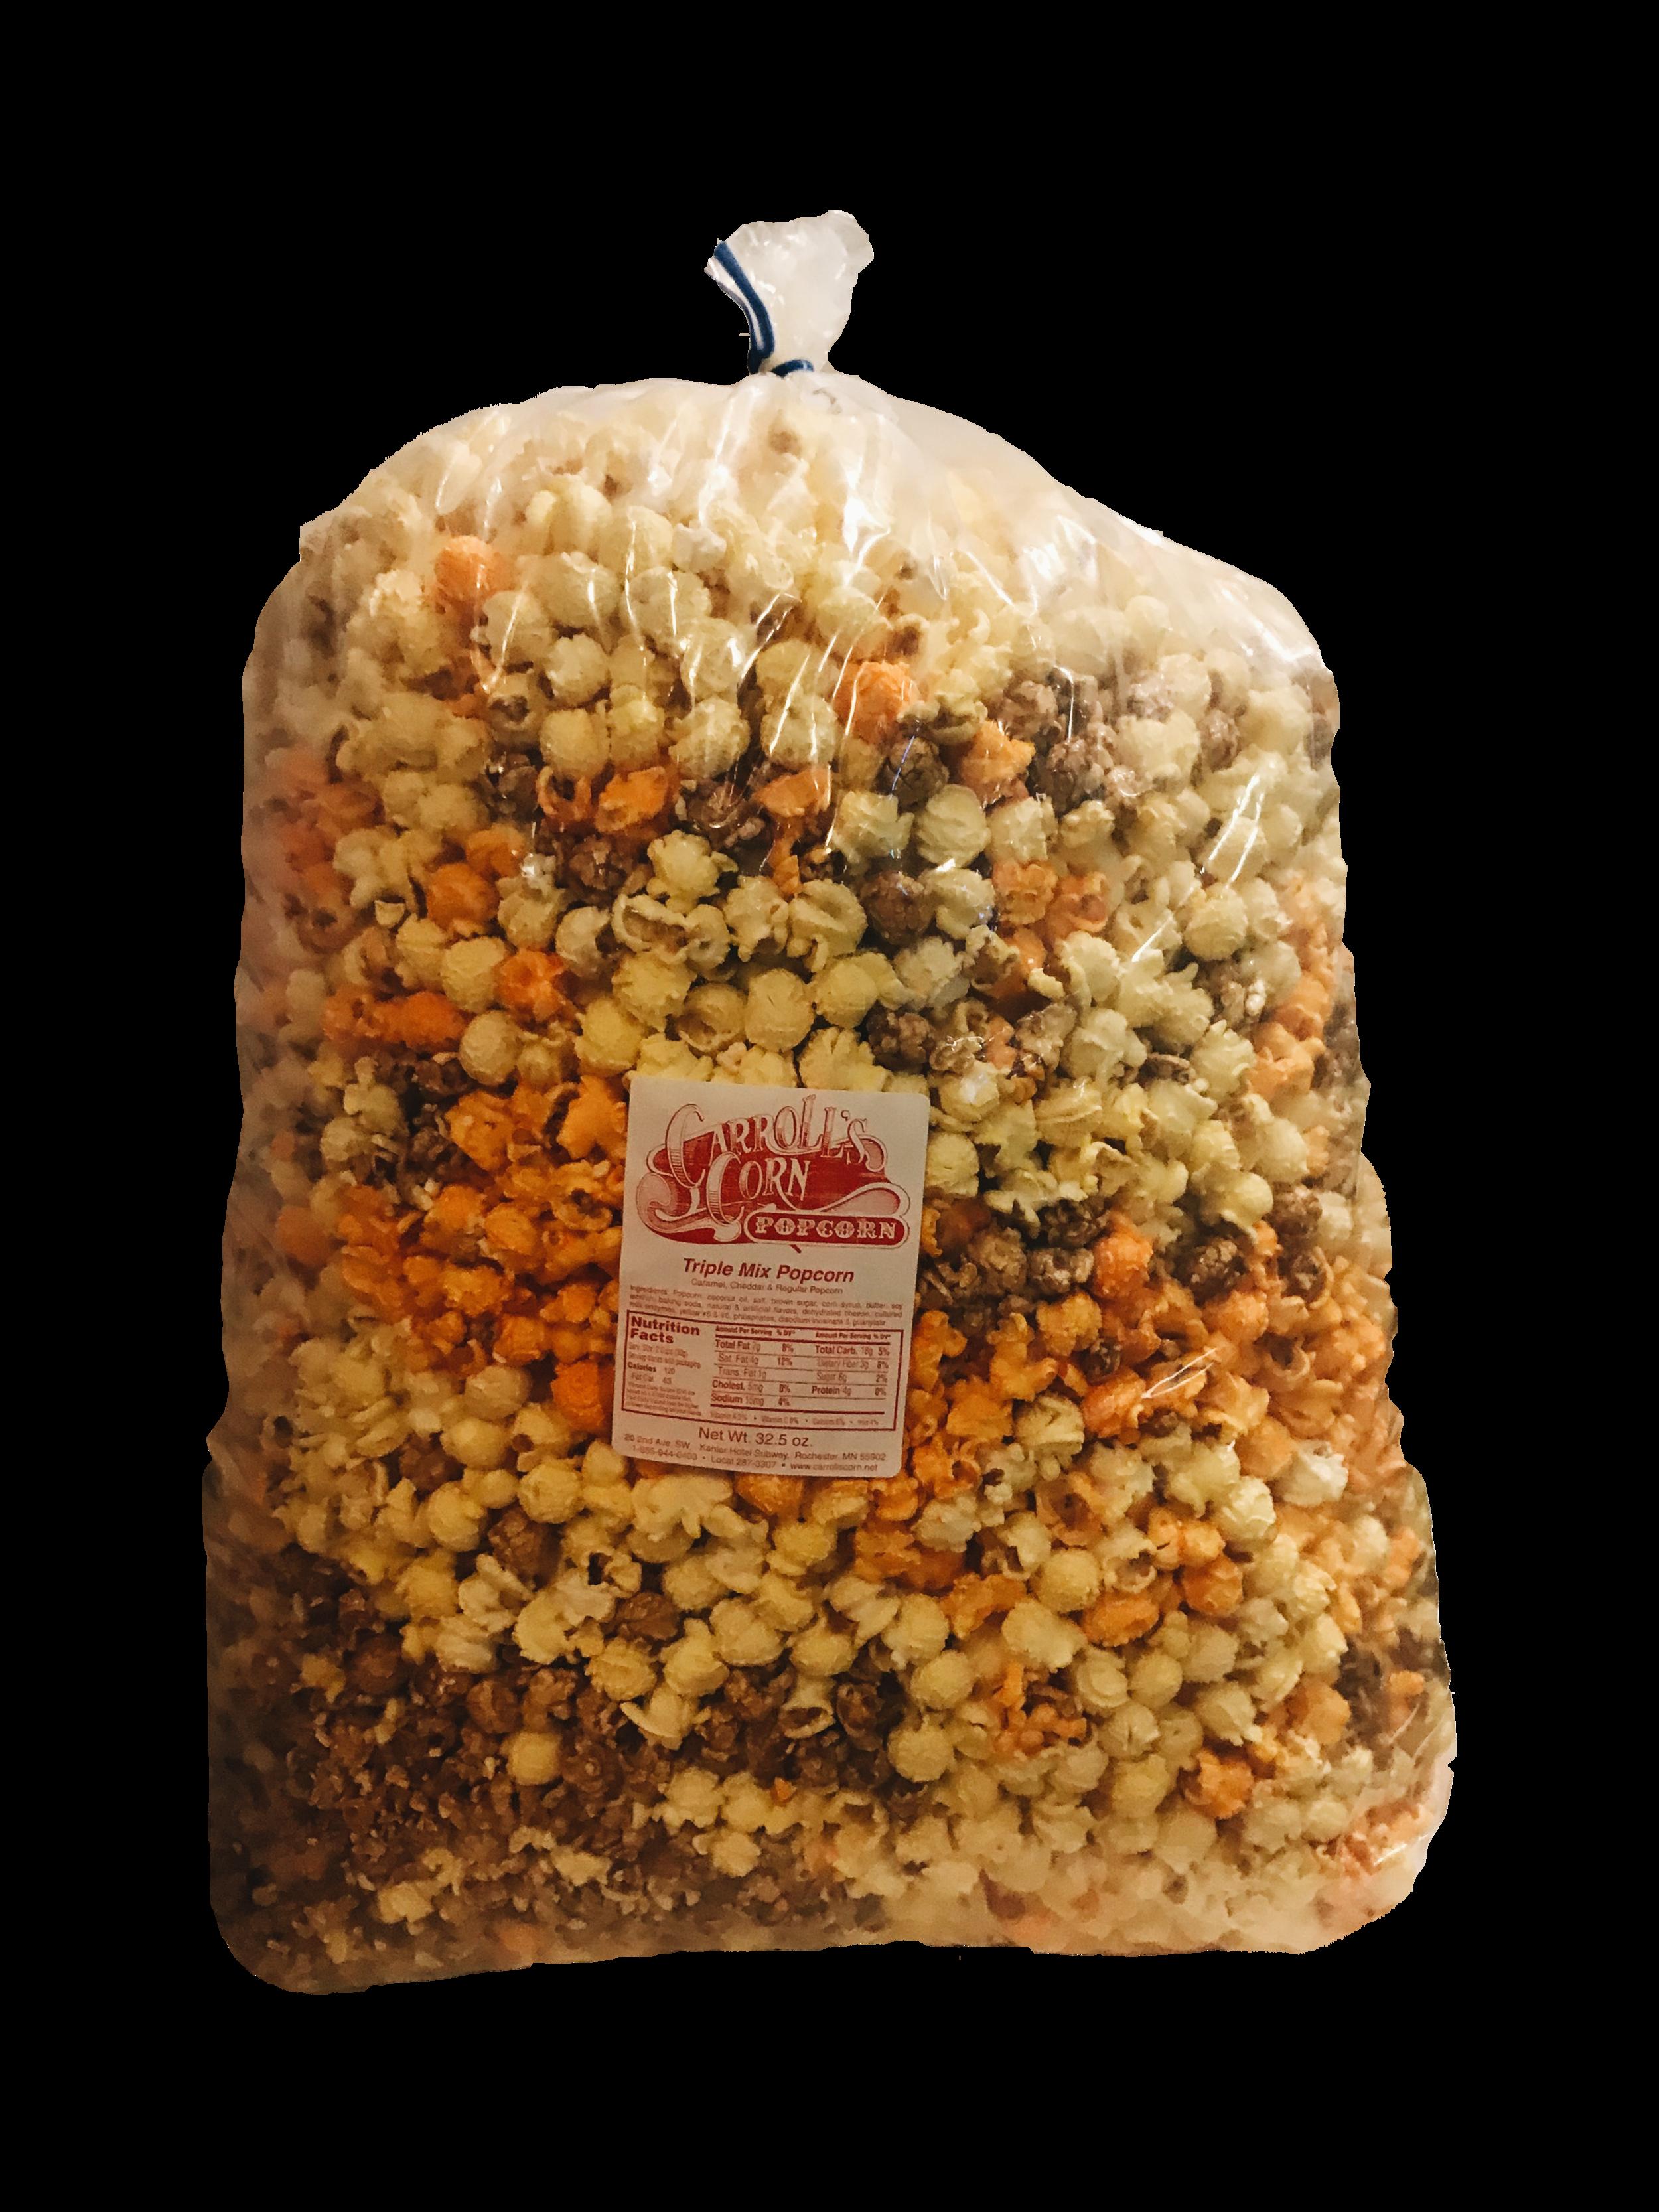 Gourmet Popcorn - Carroll's Corn